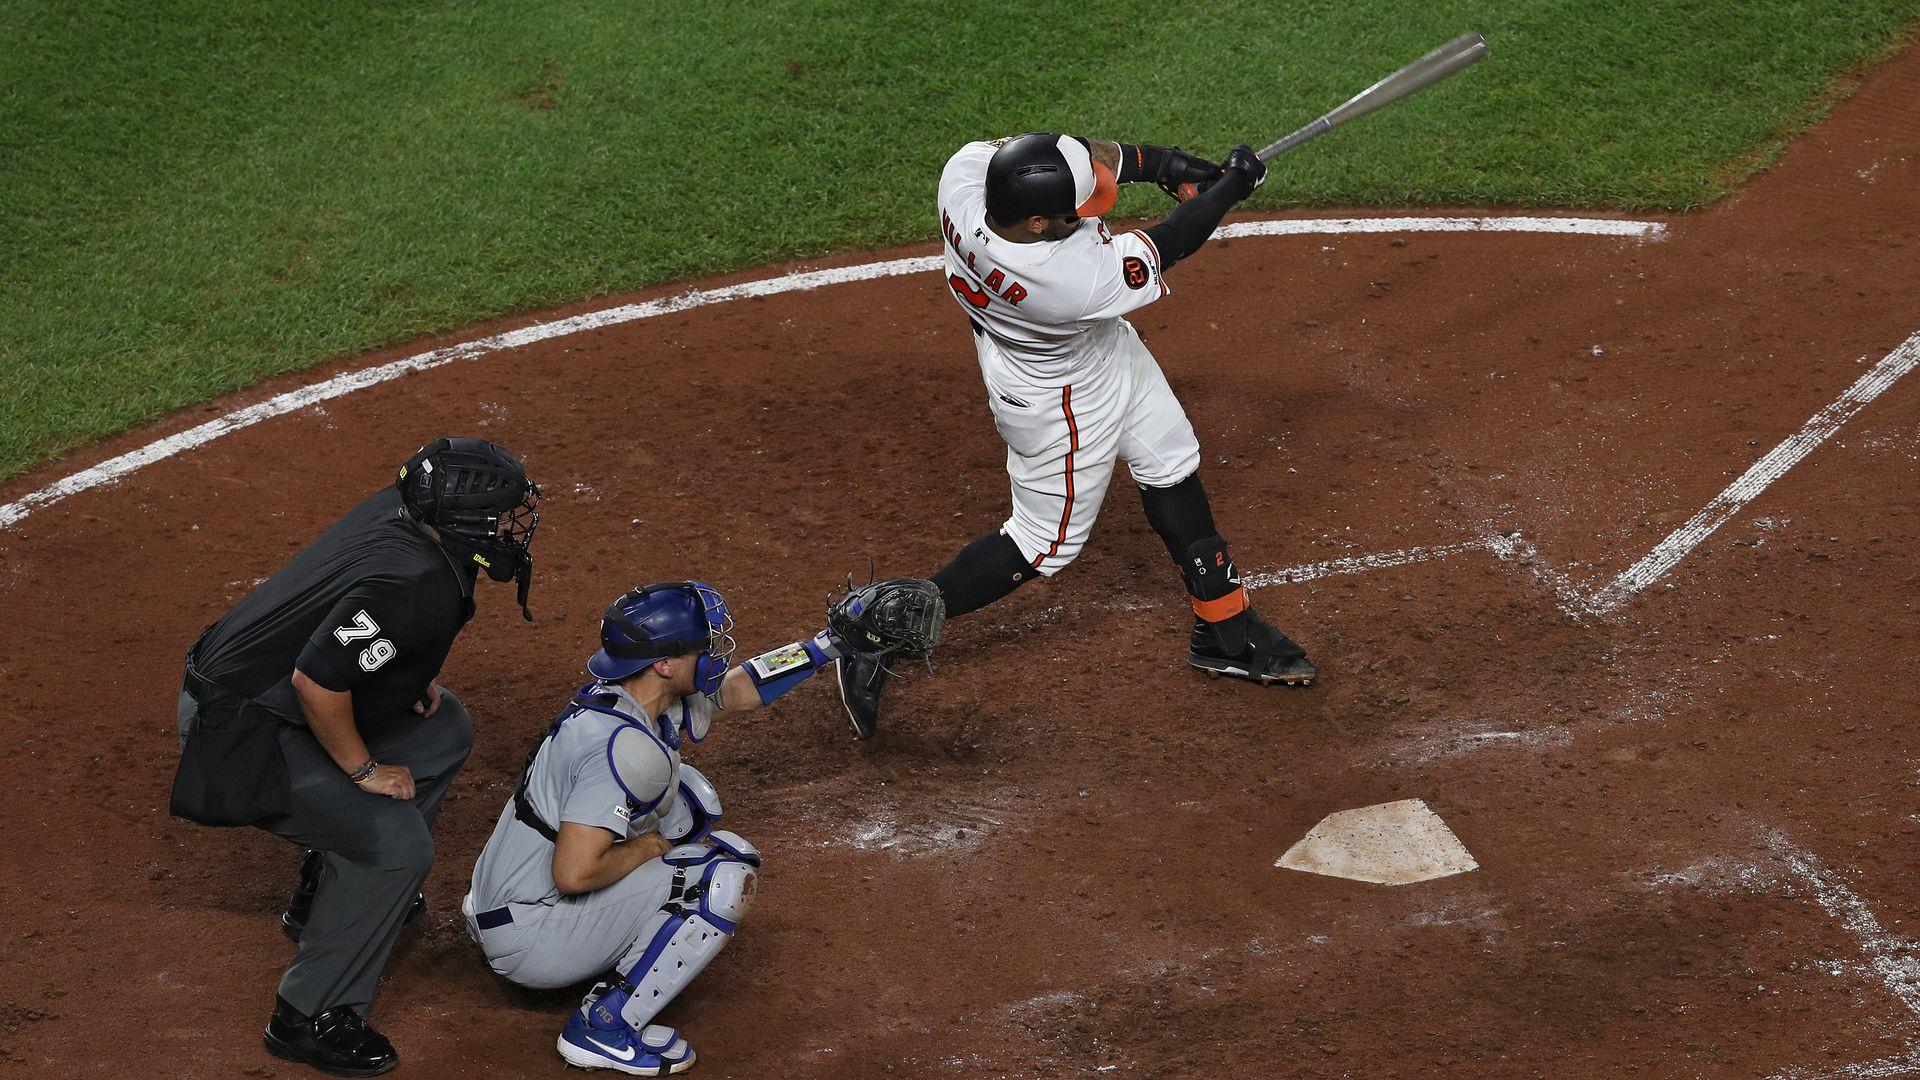 Jonathan Villar hitting the 6,106th home run of 2019.